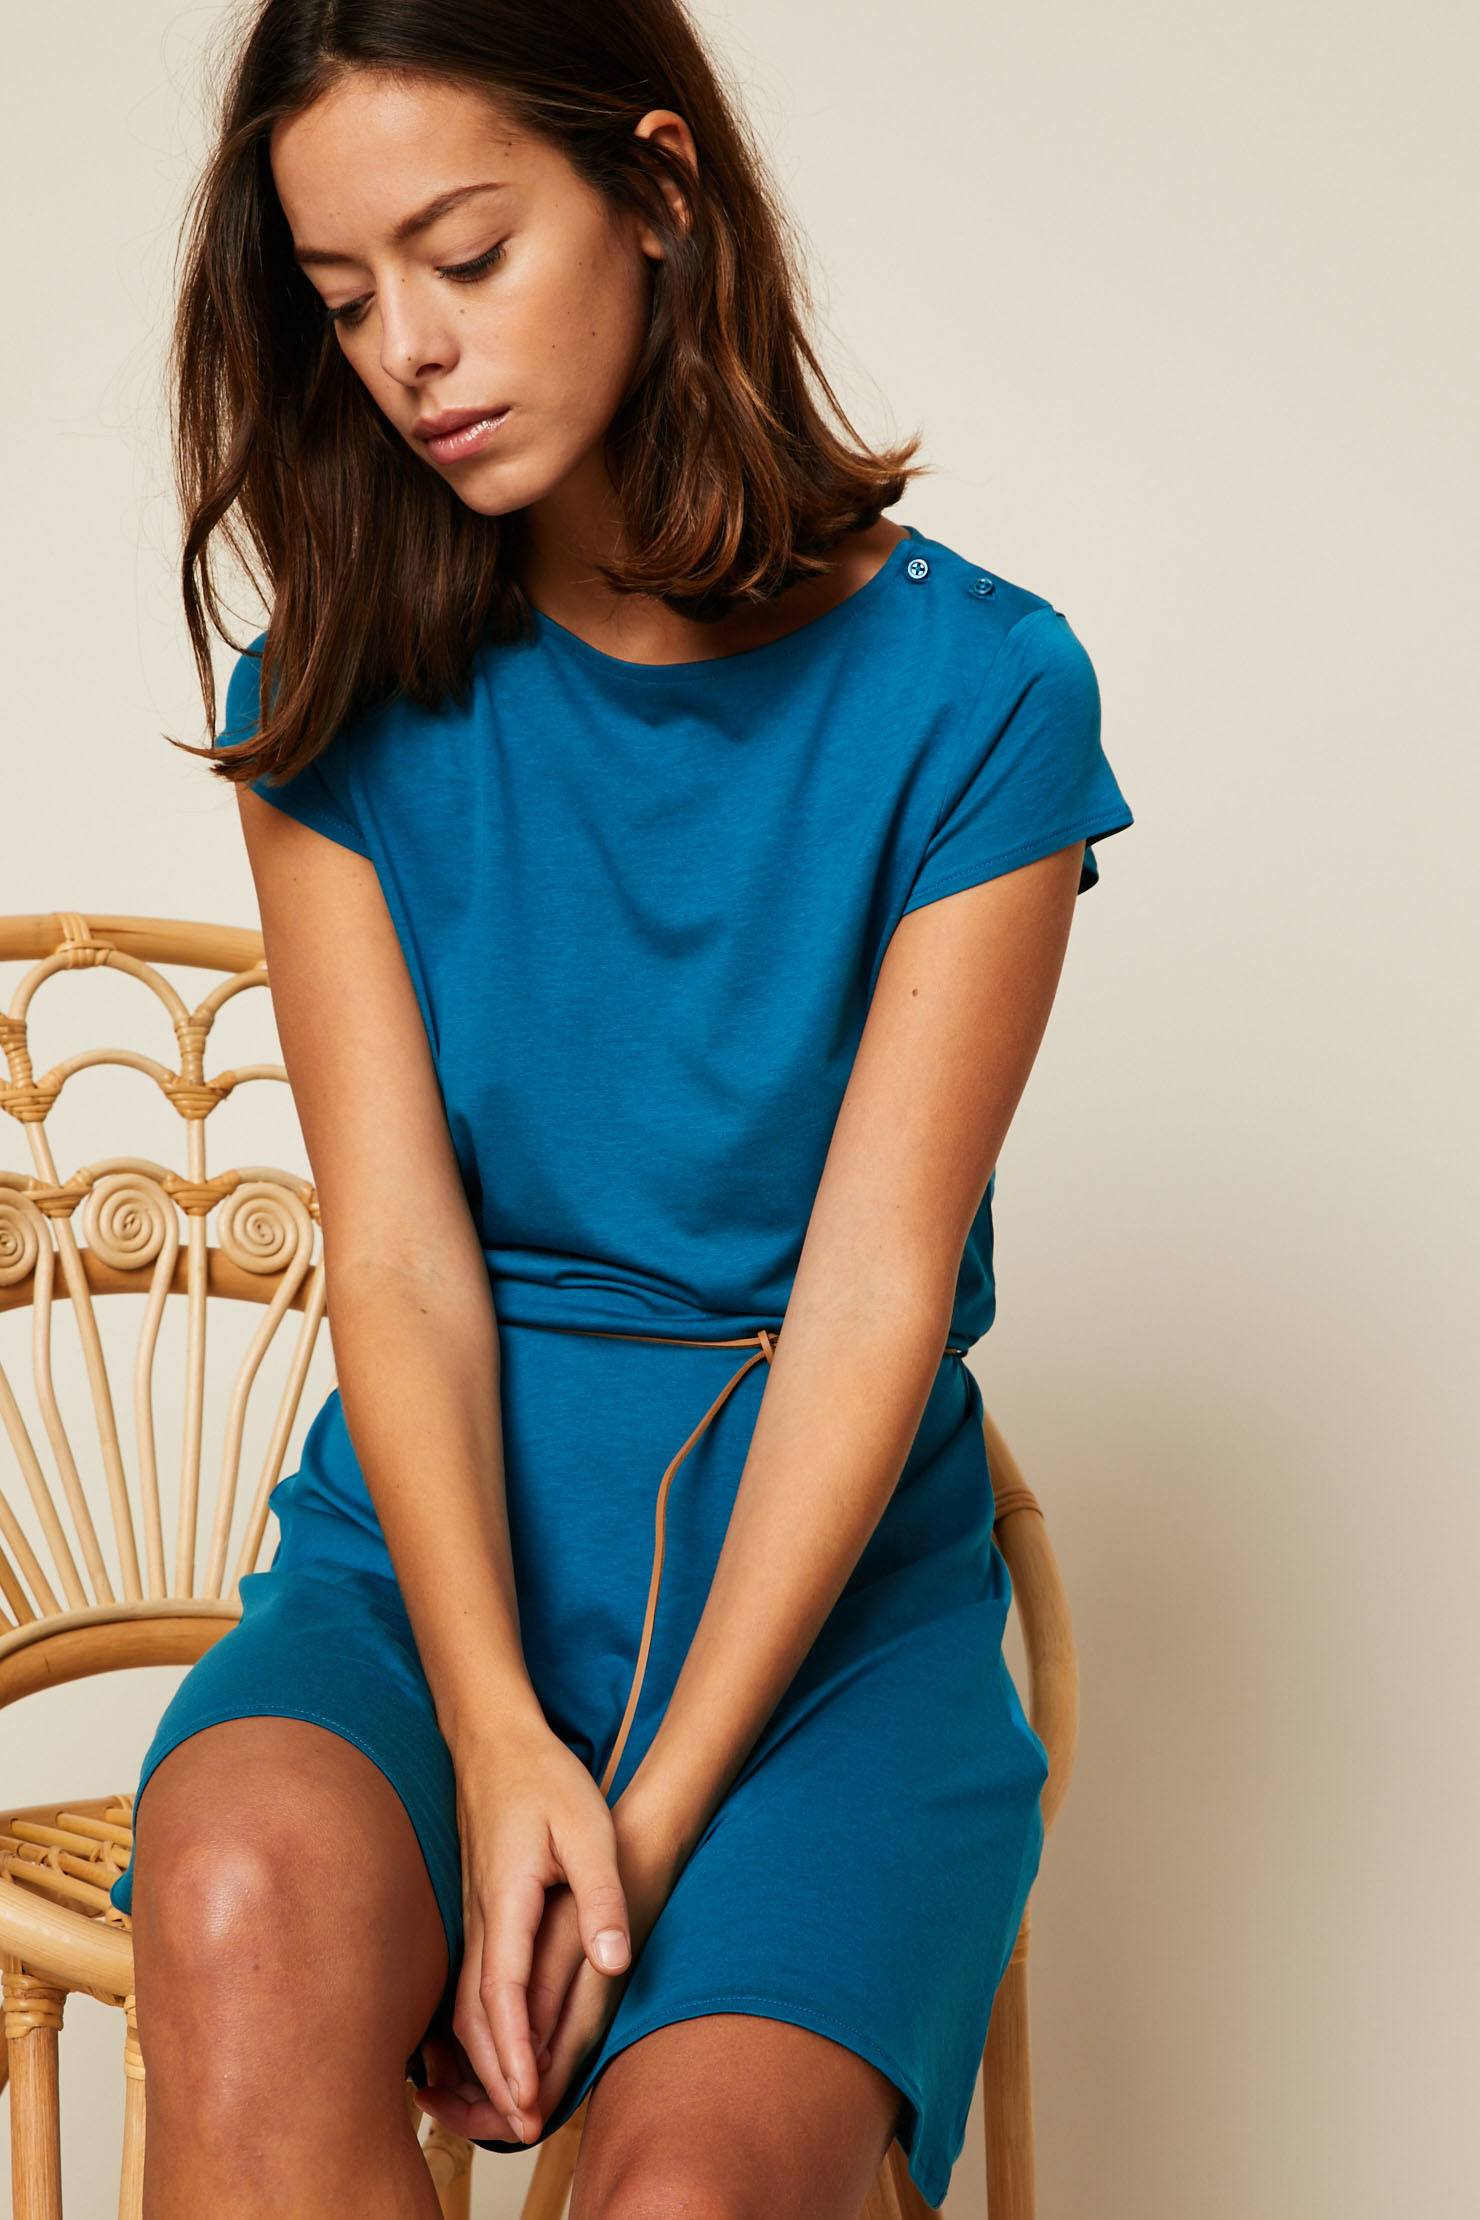 Sessun Salome Robe courte ceinturée bleu - Monshowwroom